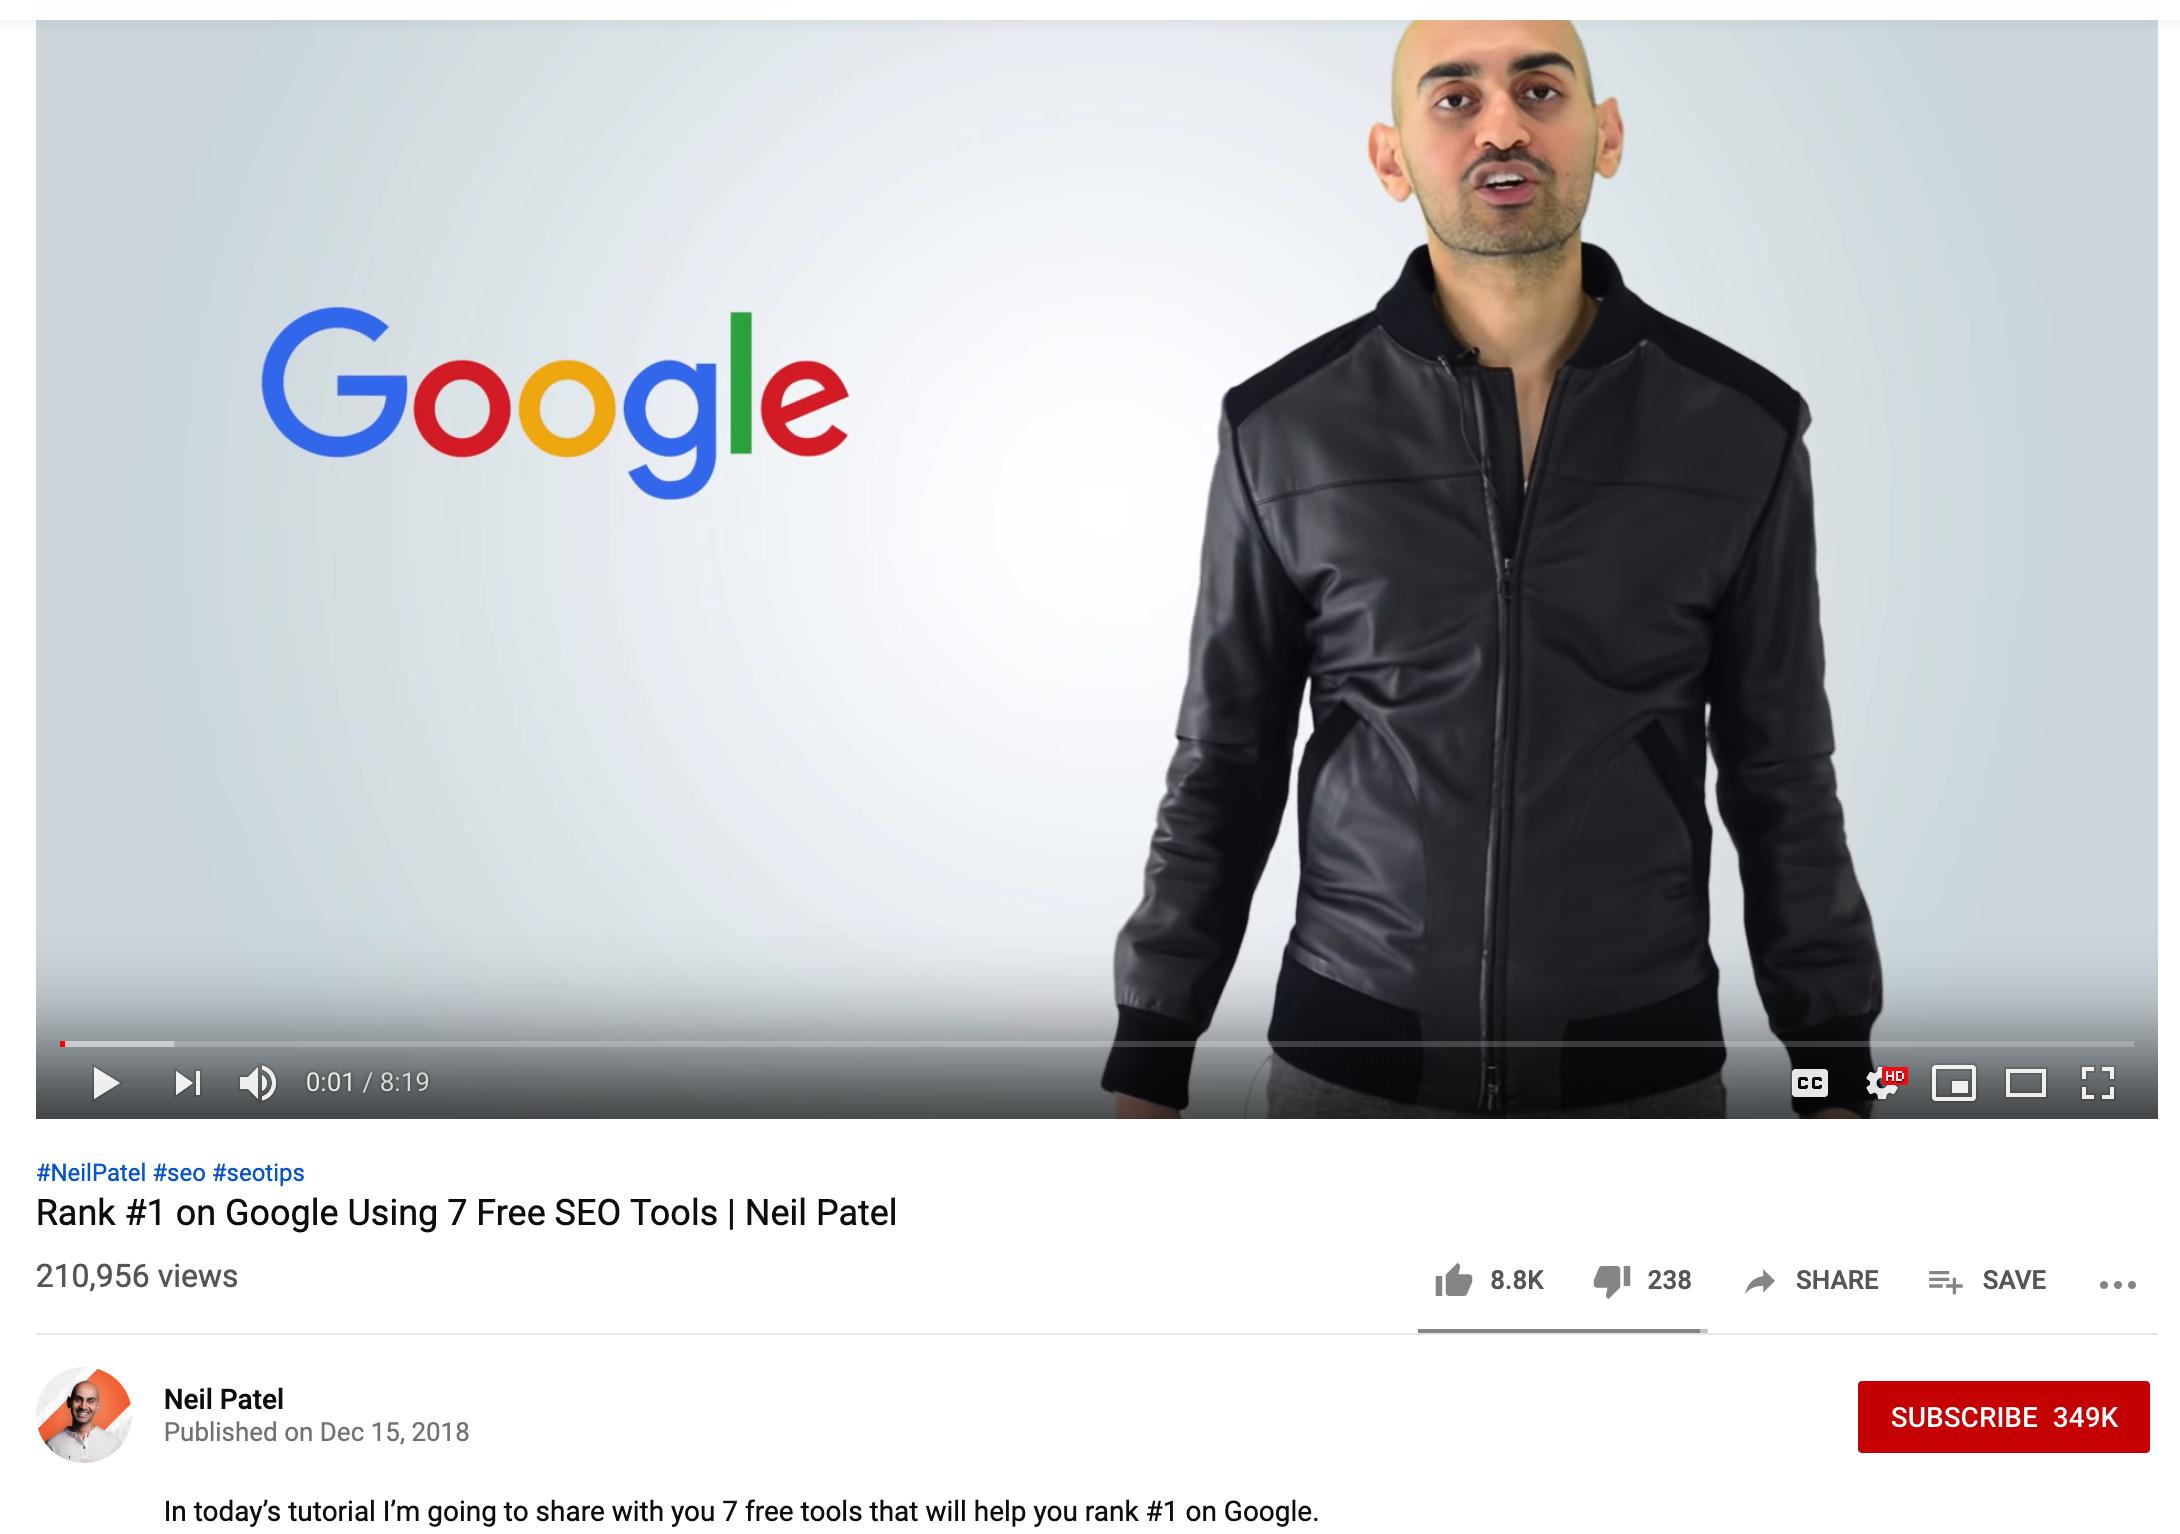 Neil Patel YouTube